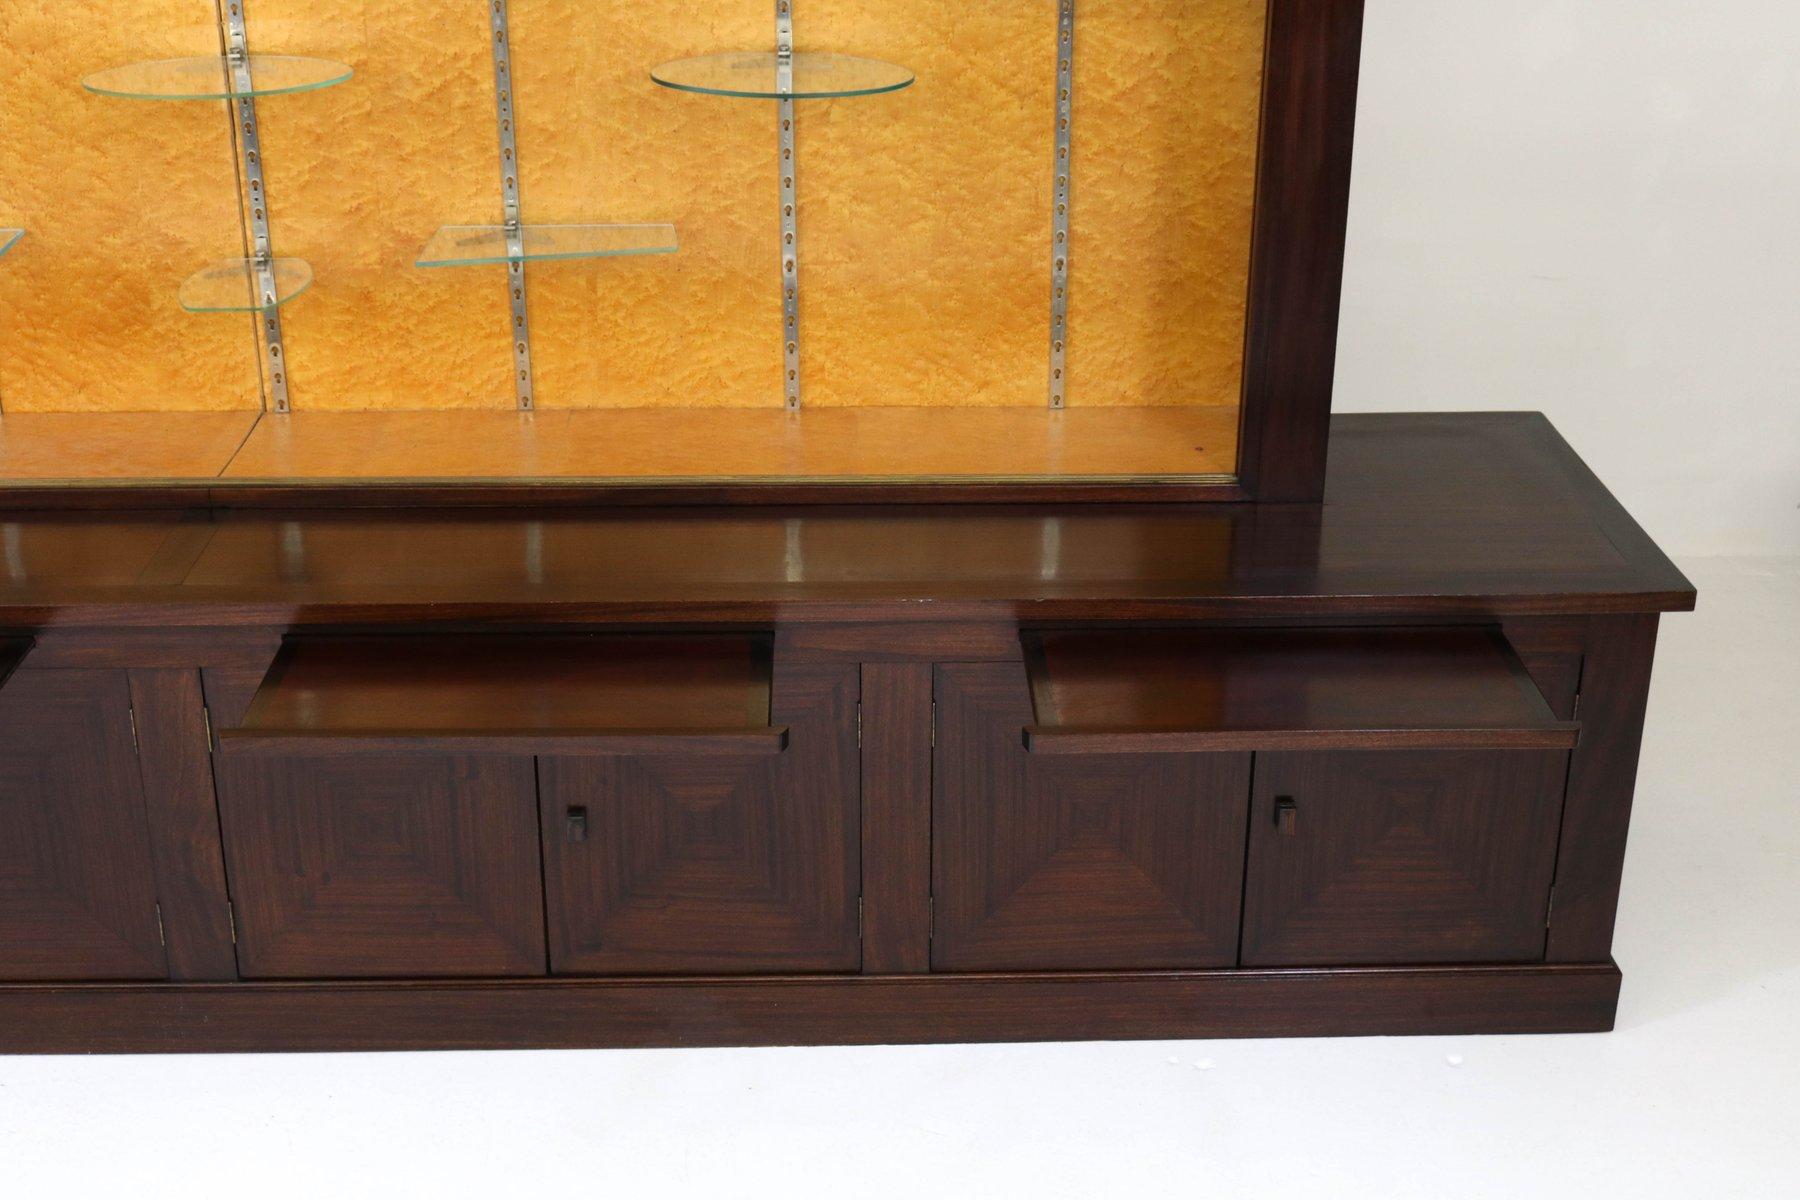 gro e mahagoni art deco vitrine mit glas schiebet ren. Black Bedroom Furniture Sets. Home Design Ideas